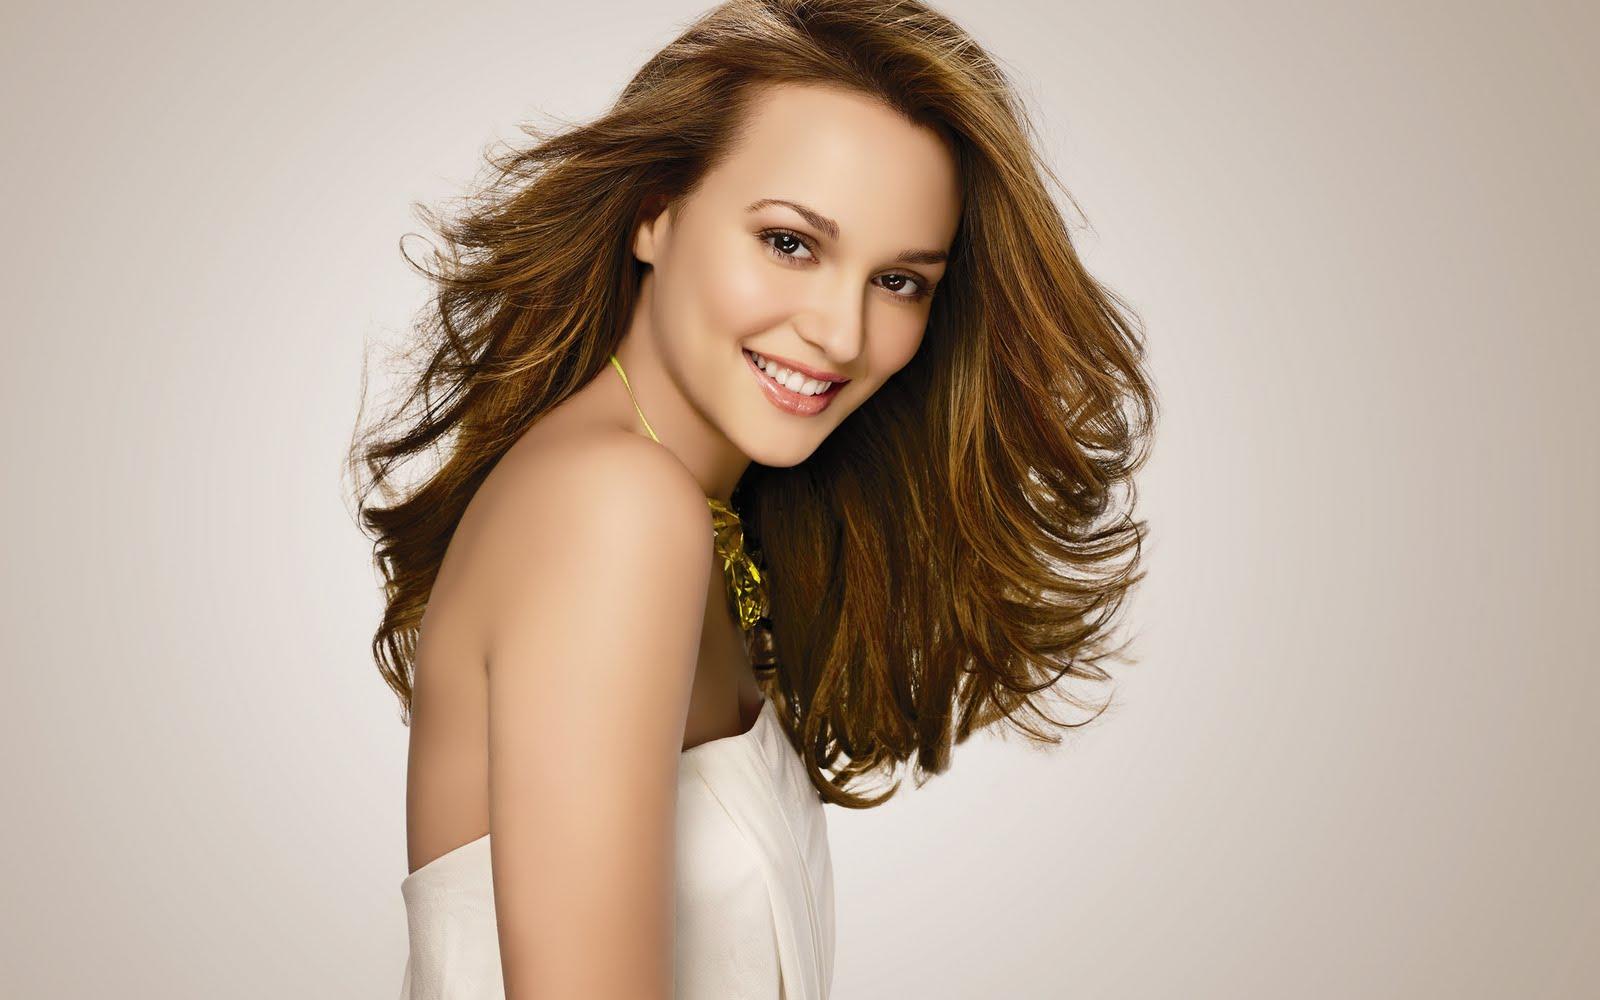 Beautiful Hollywood Girls   Actress Celebrities Wallpapers 1600x1000